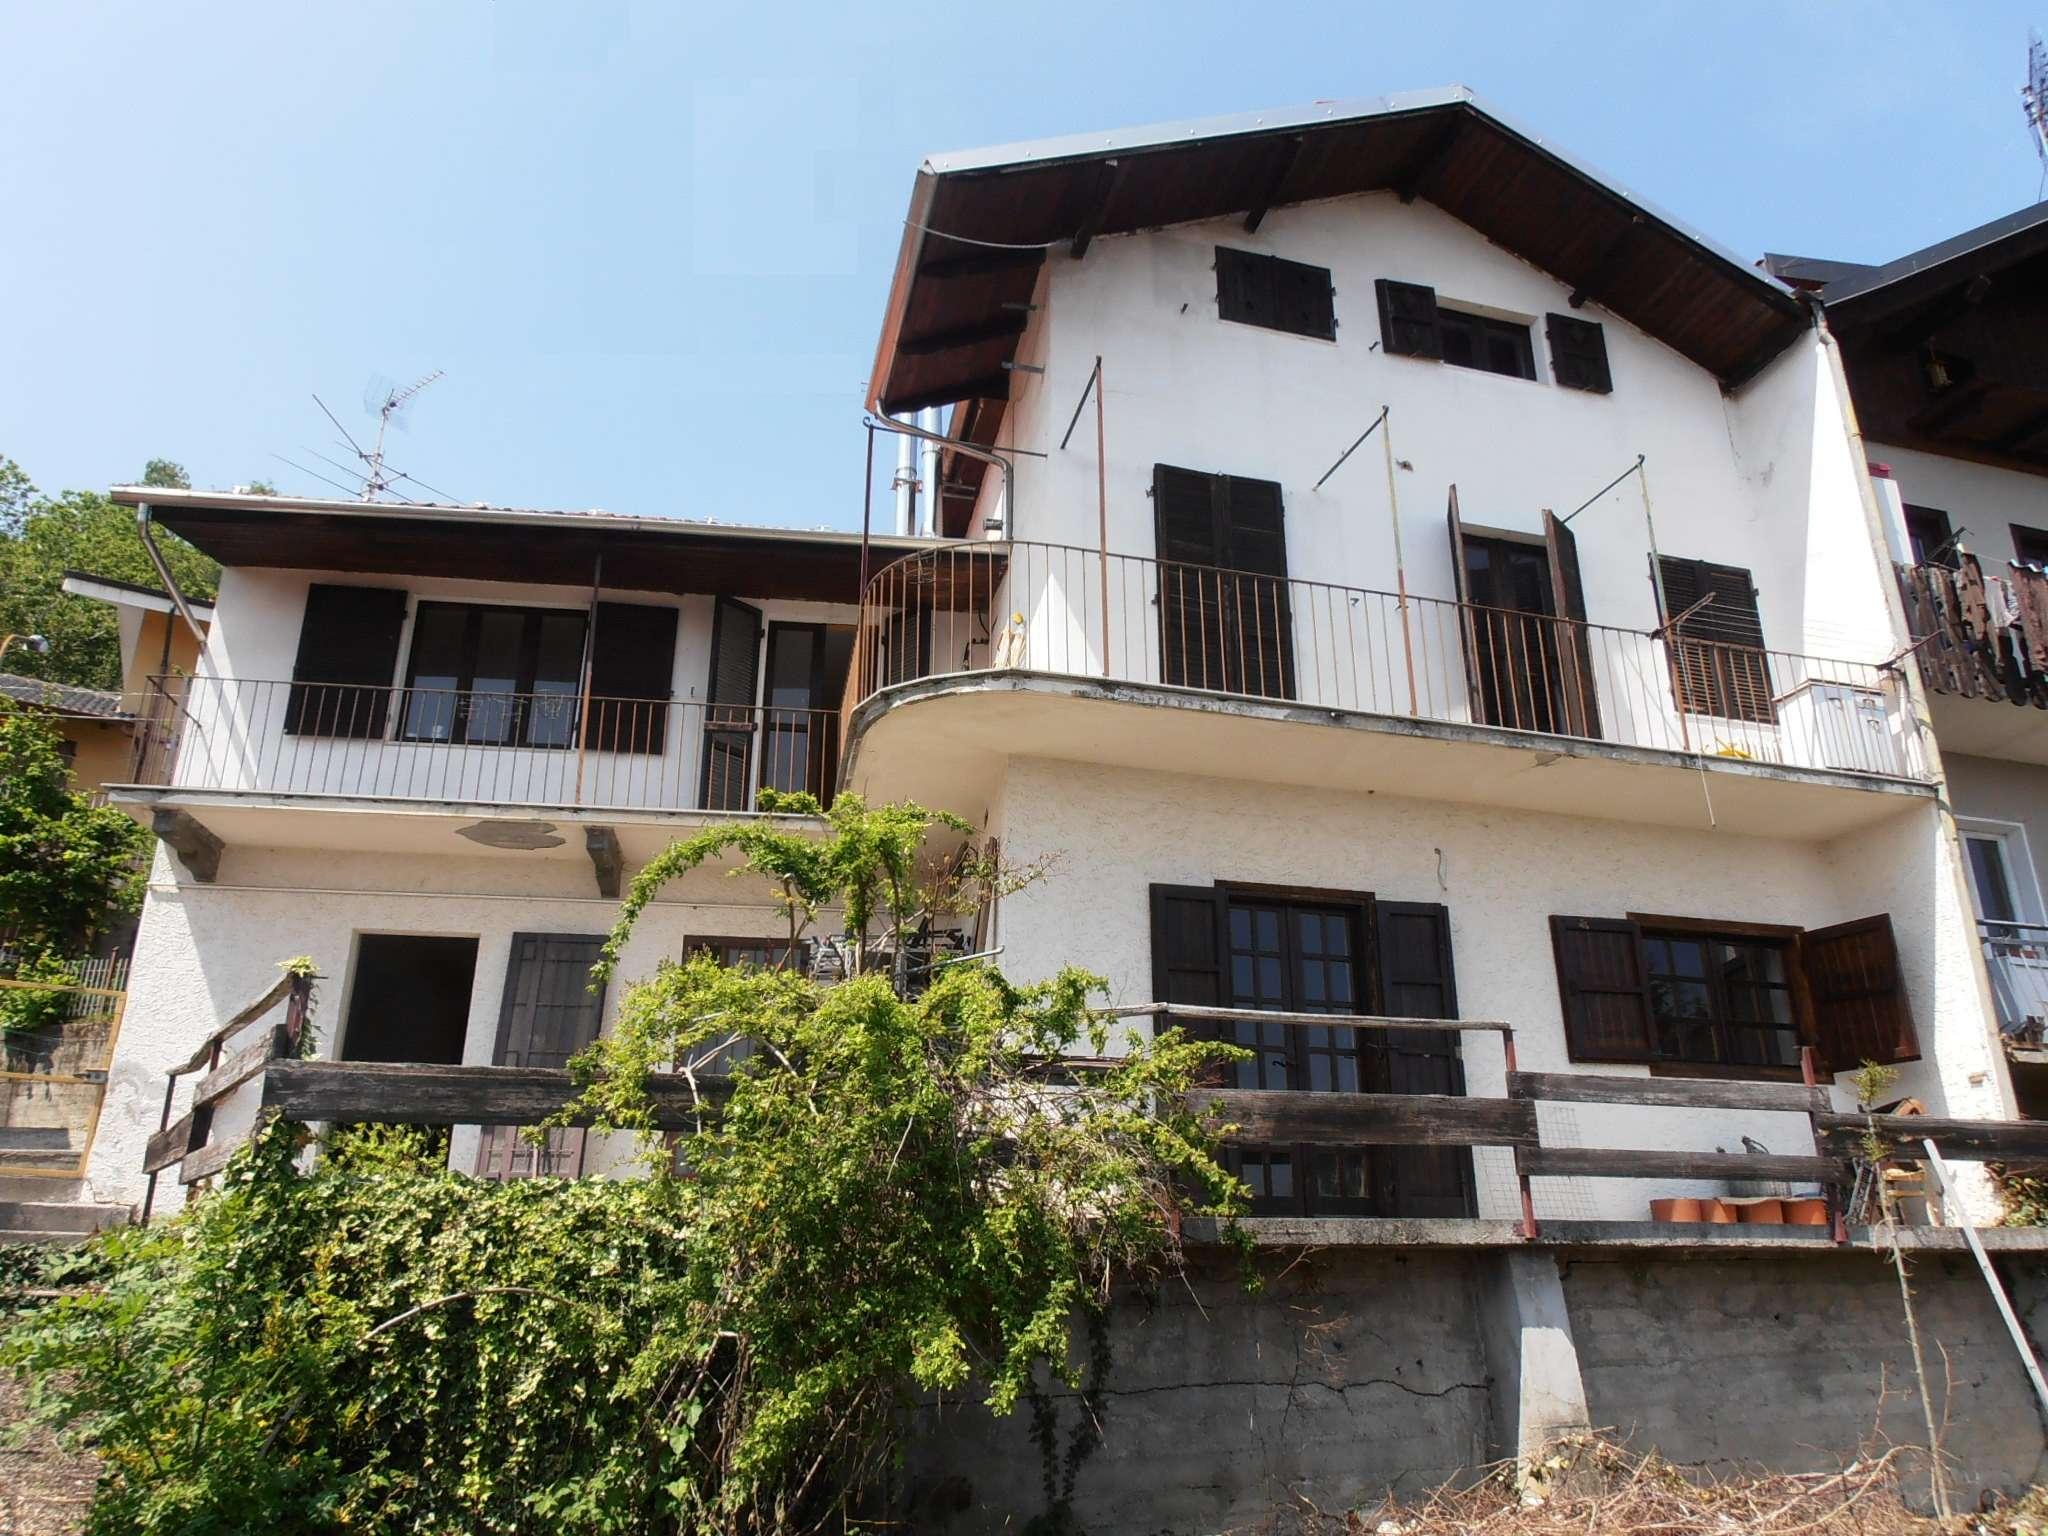 Foto 1 di Casa indipendente via montecomposto 17, Villar Dora